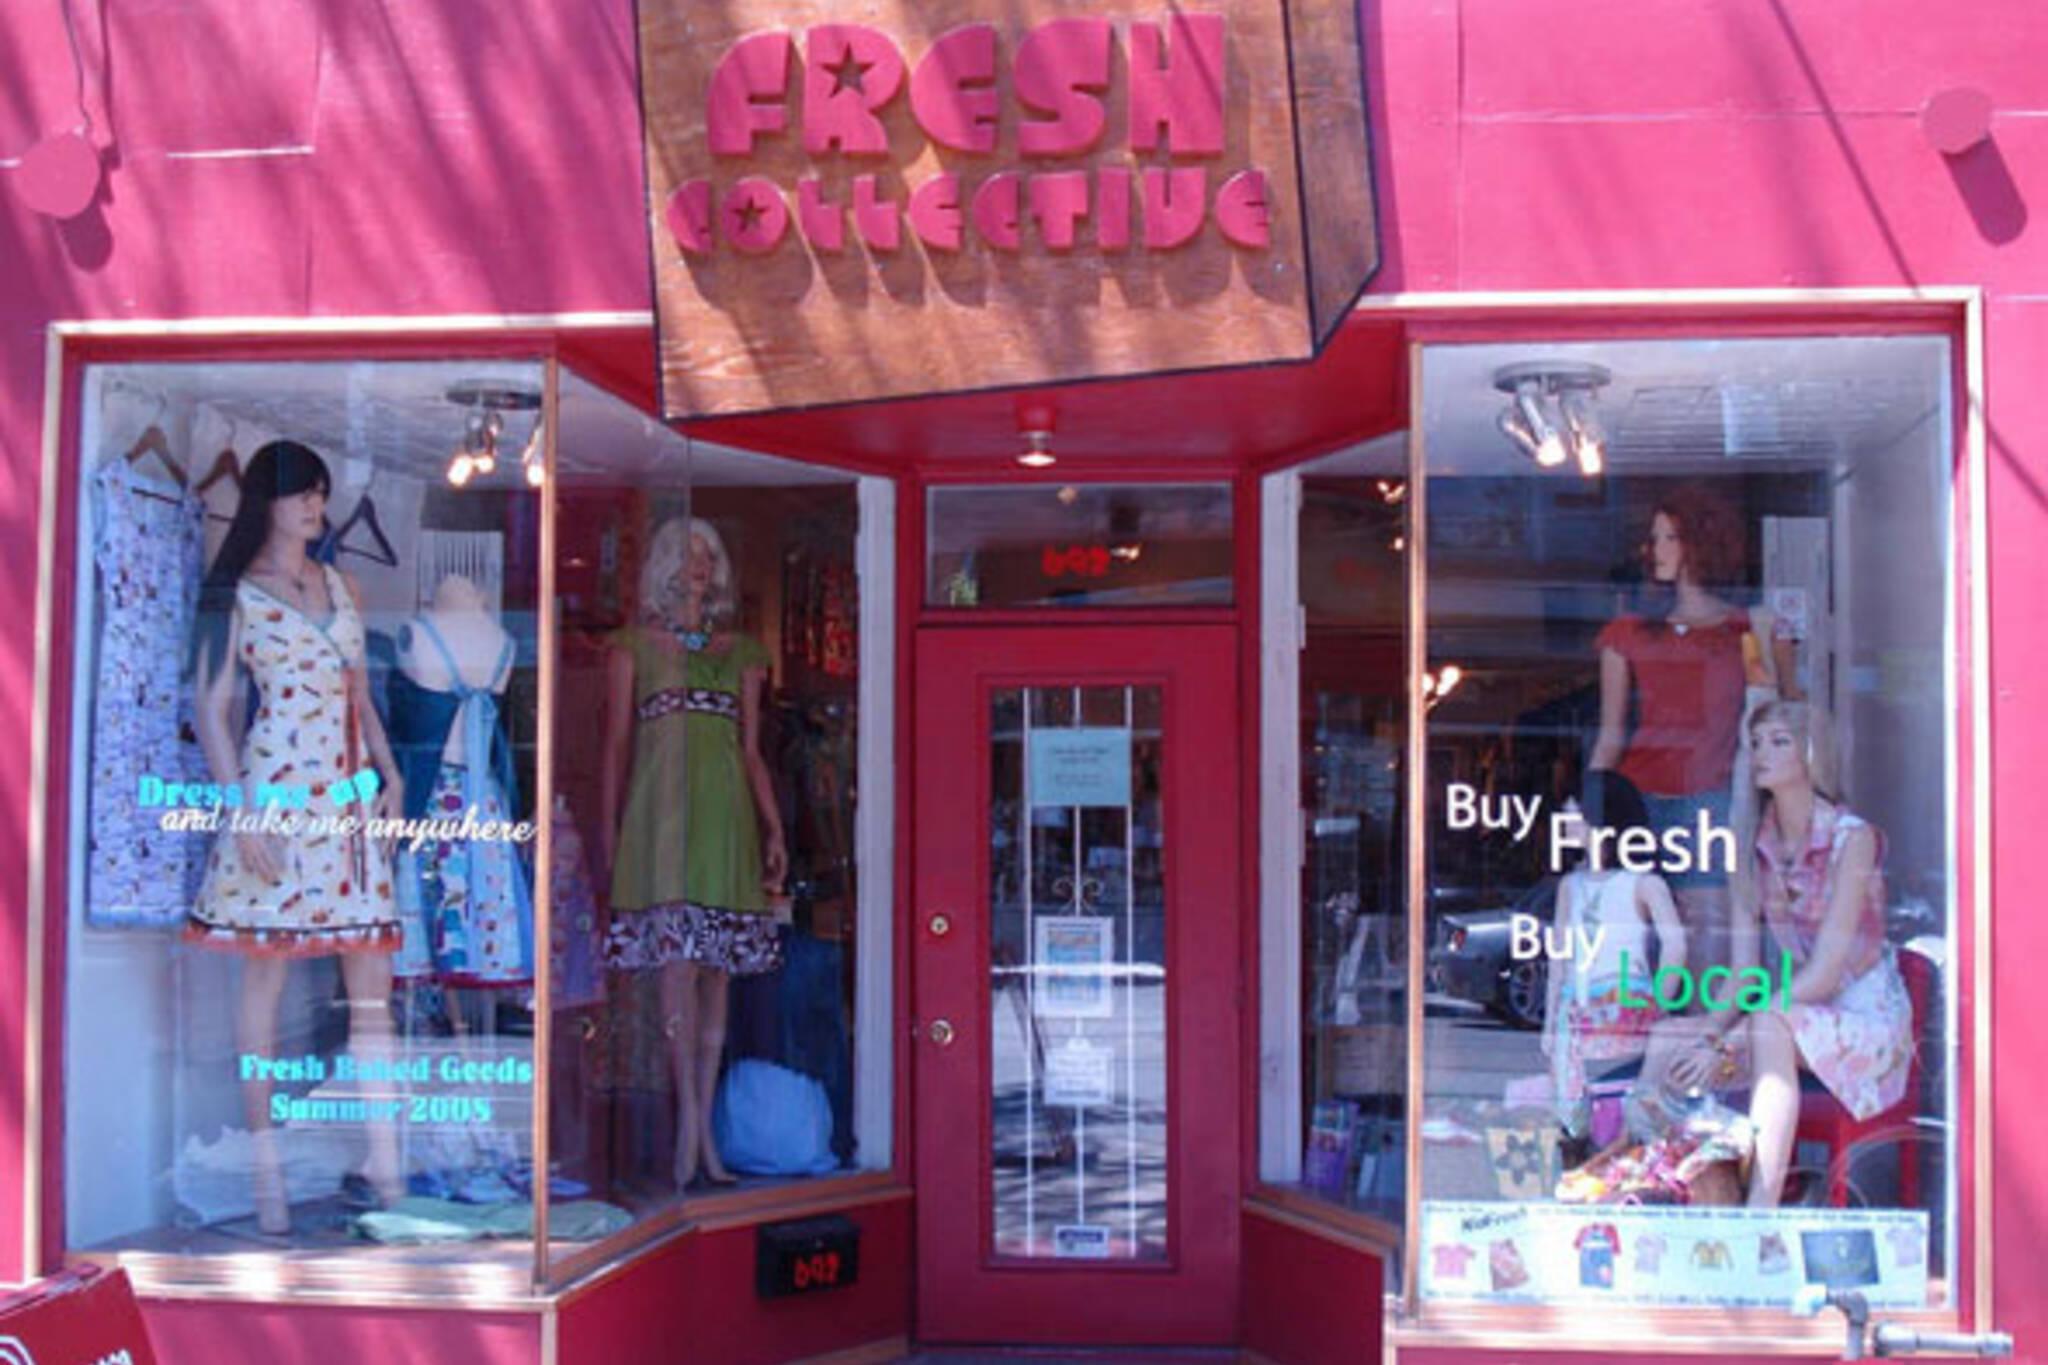 200806015_freshcollective01.jpg